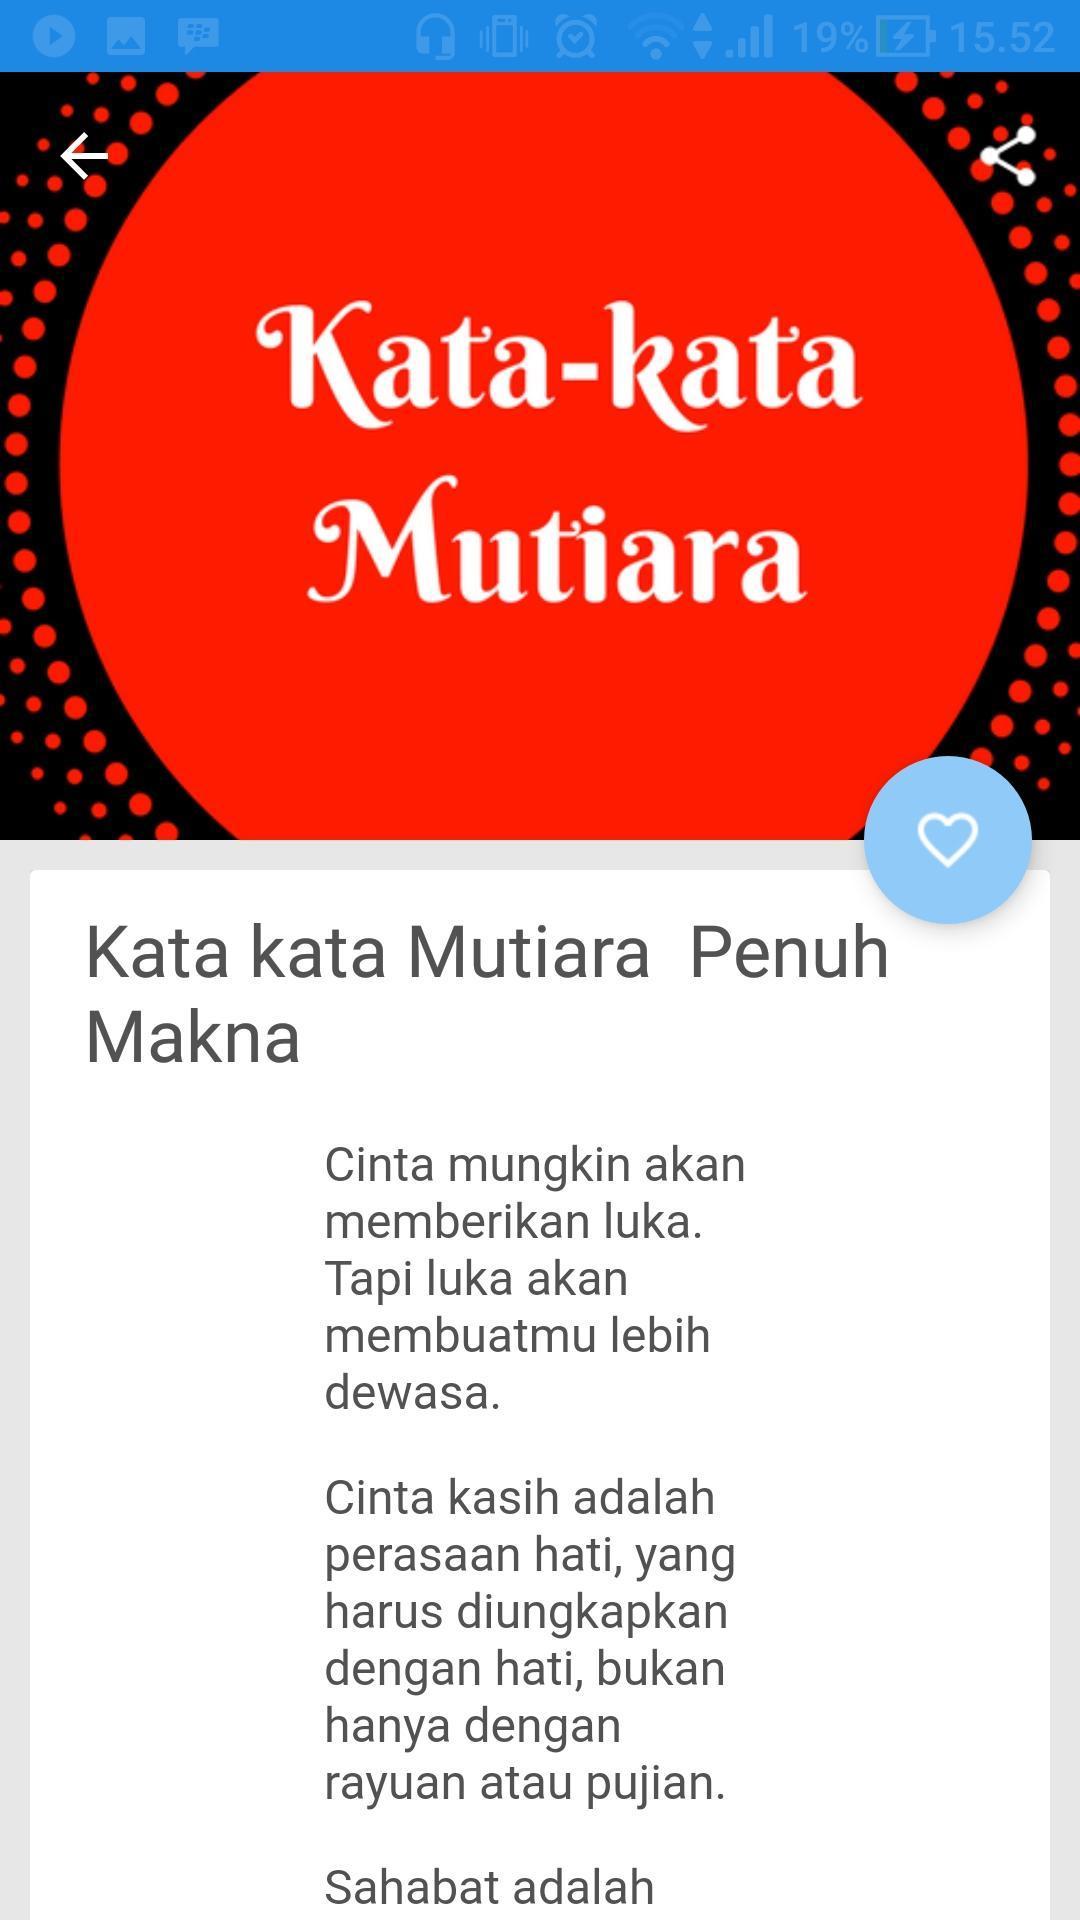 Kata Kata Mutiara For Android Apk Download